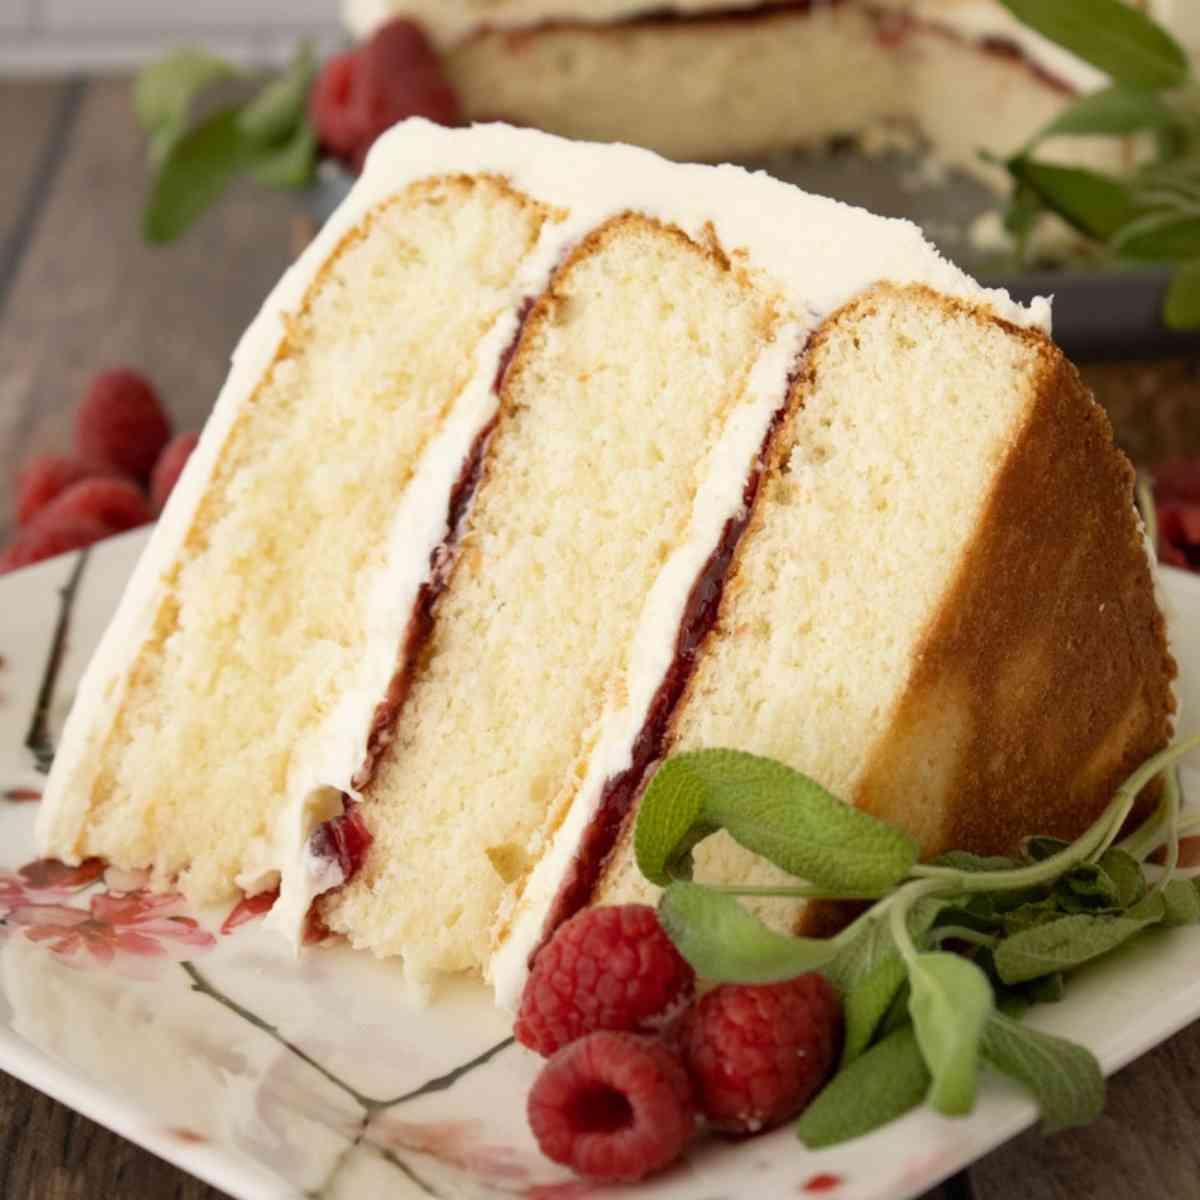 Slice of vanilla raspberry cake garnished with raspberries.